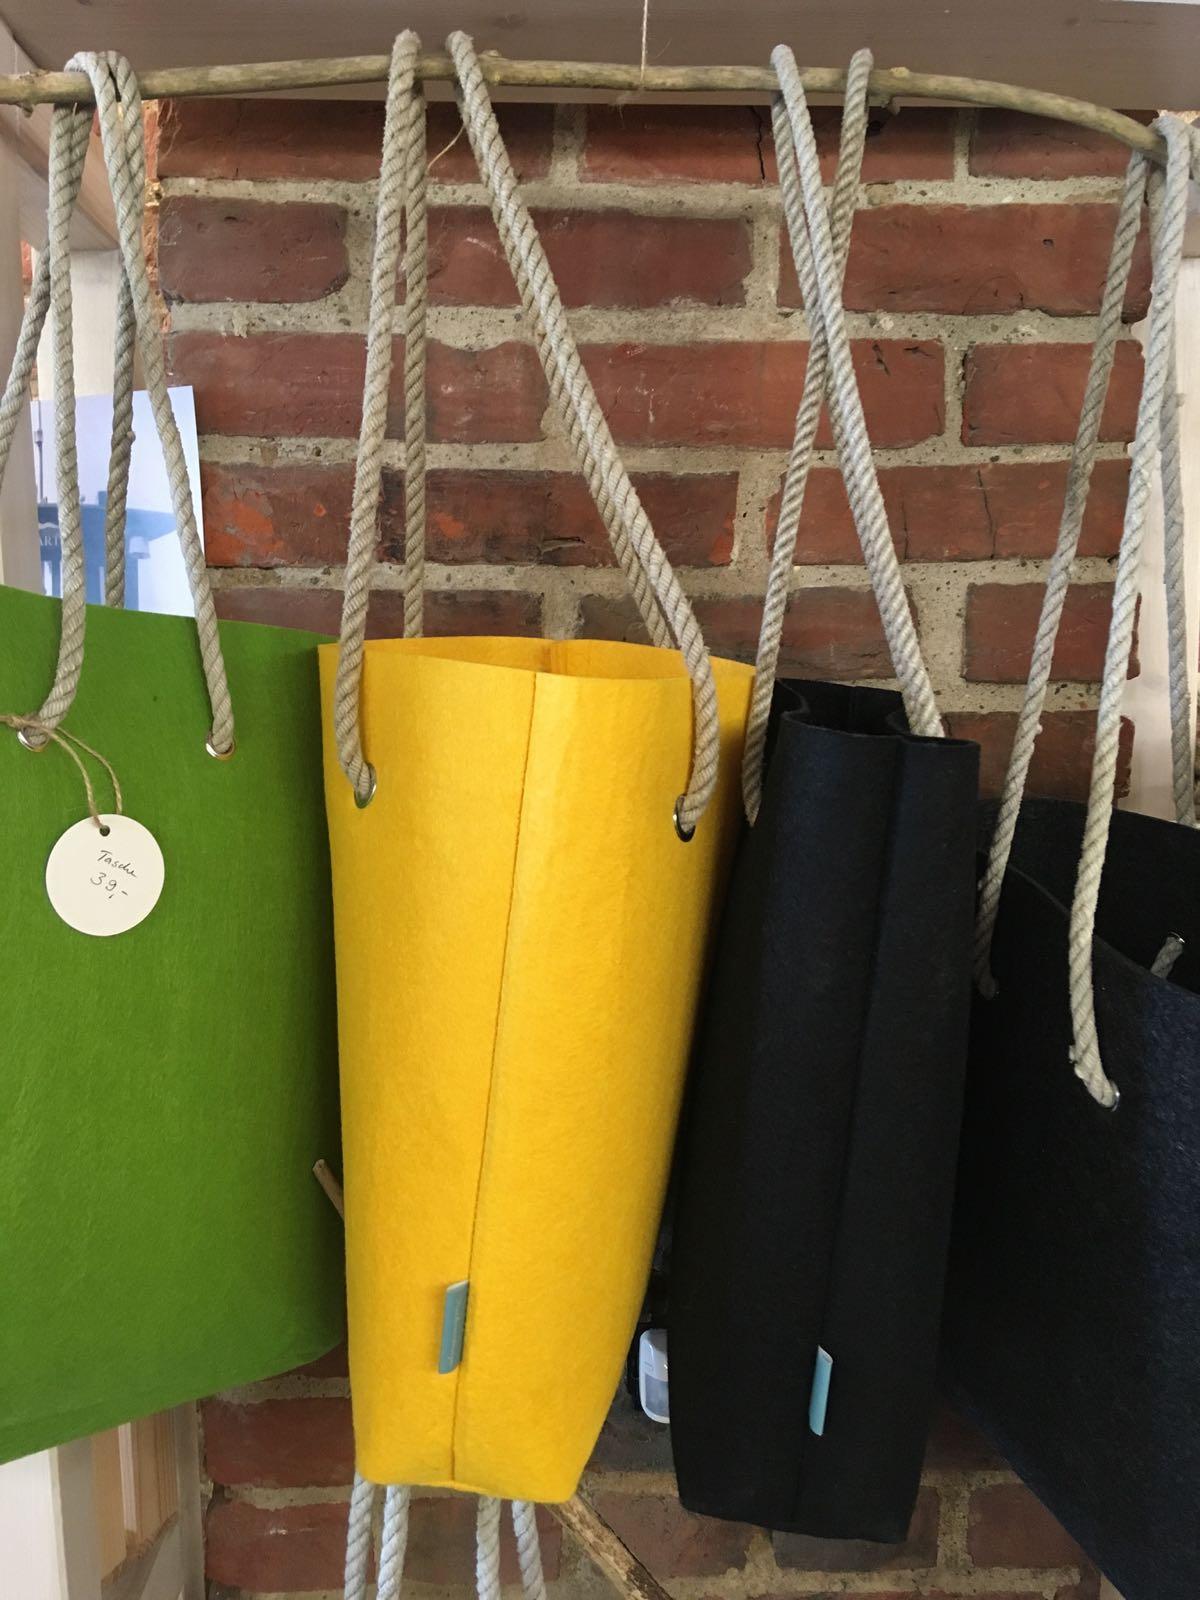 Fischereidesign - Filztasche mit Tampenhenkel